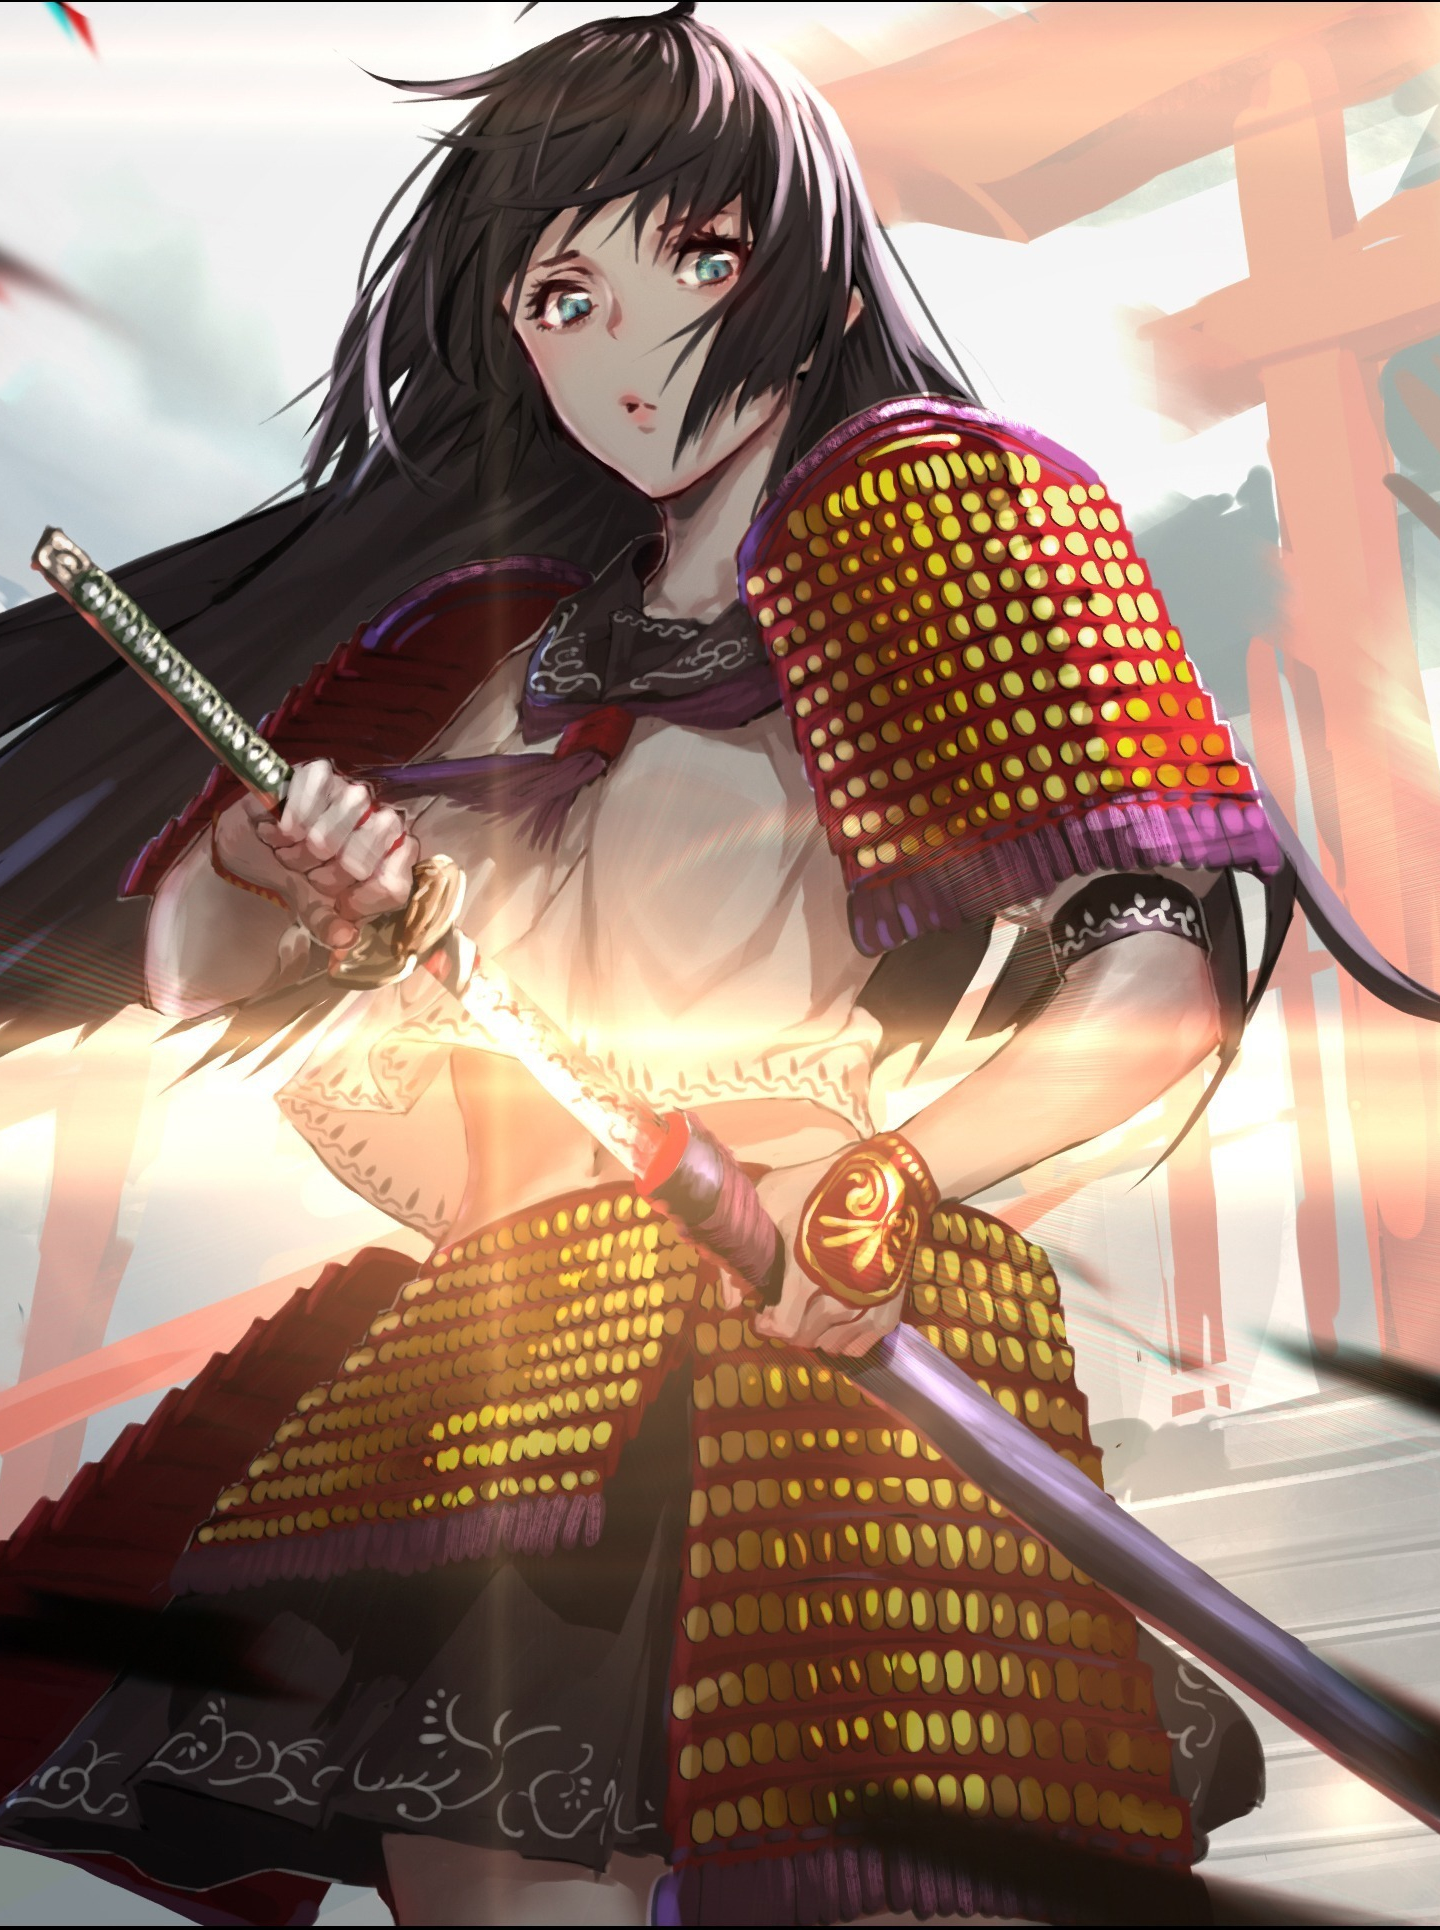 Download 1440x2560 Wallpaper Ninja Warrior Girl Anime Original